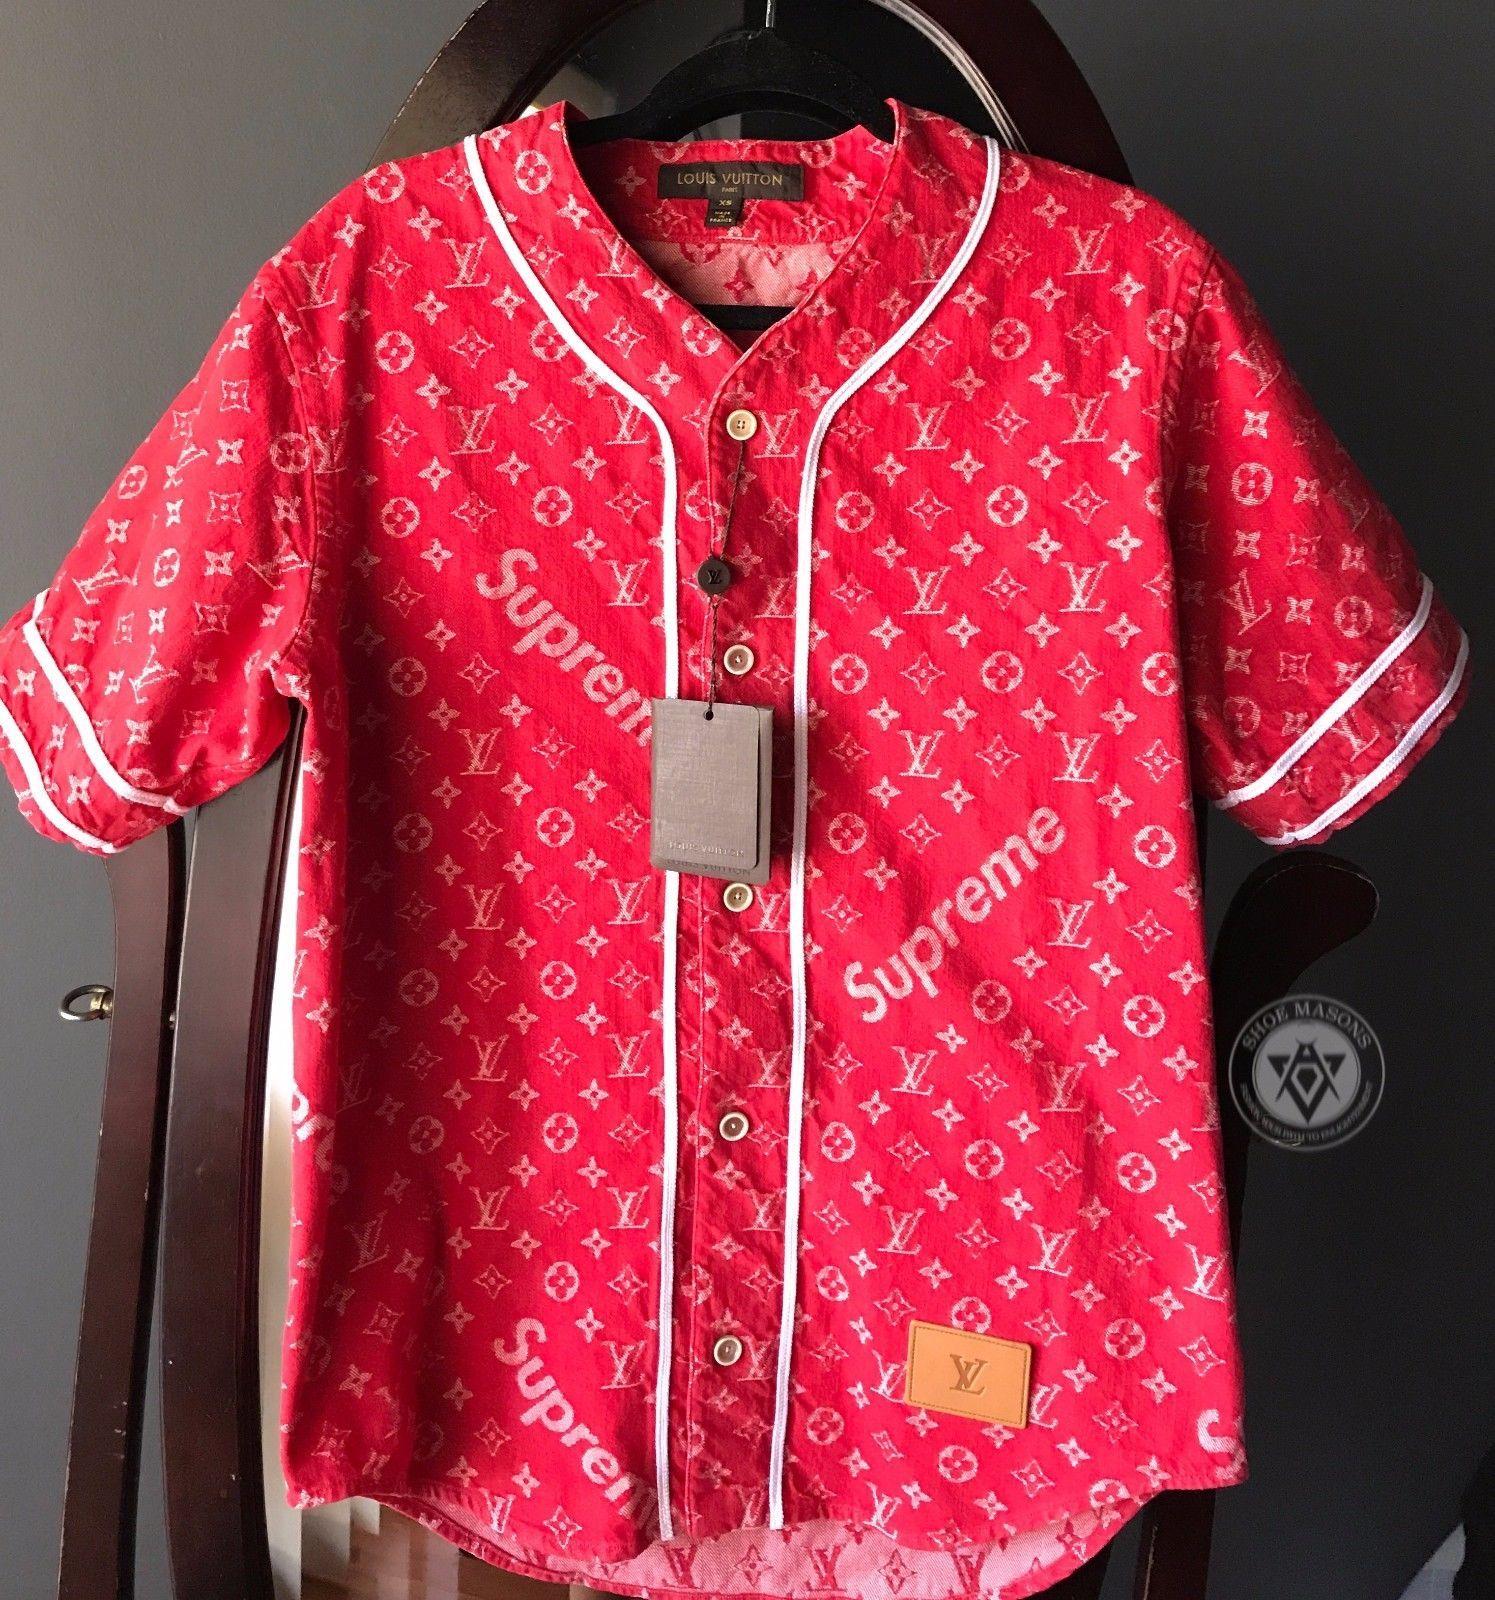 7bd2e2904ce52c Supreme Louis Vuitton Jacquard Denim Baseball Jersey Red Size XS - S +  Receipt #clothing #shoes #accessories #mens #apparel #athletic #receipt # size ...